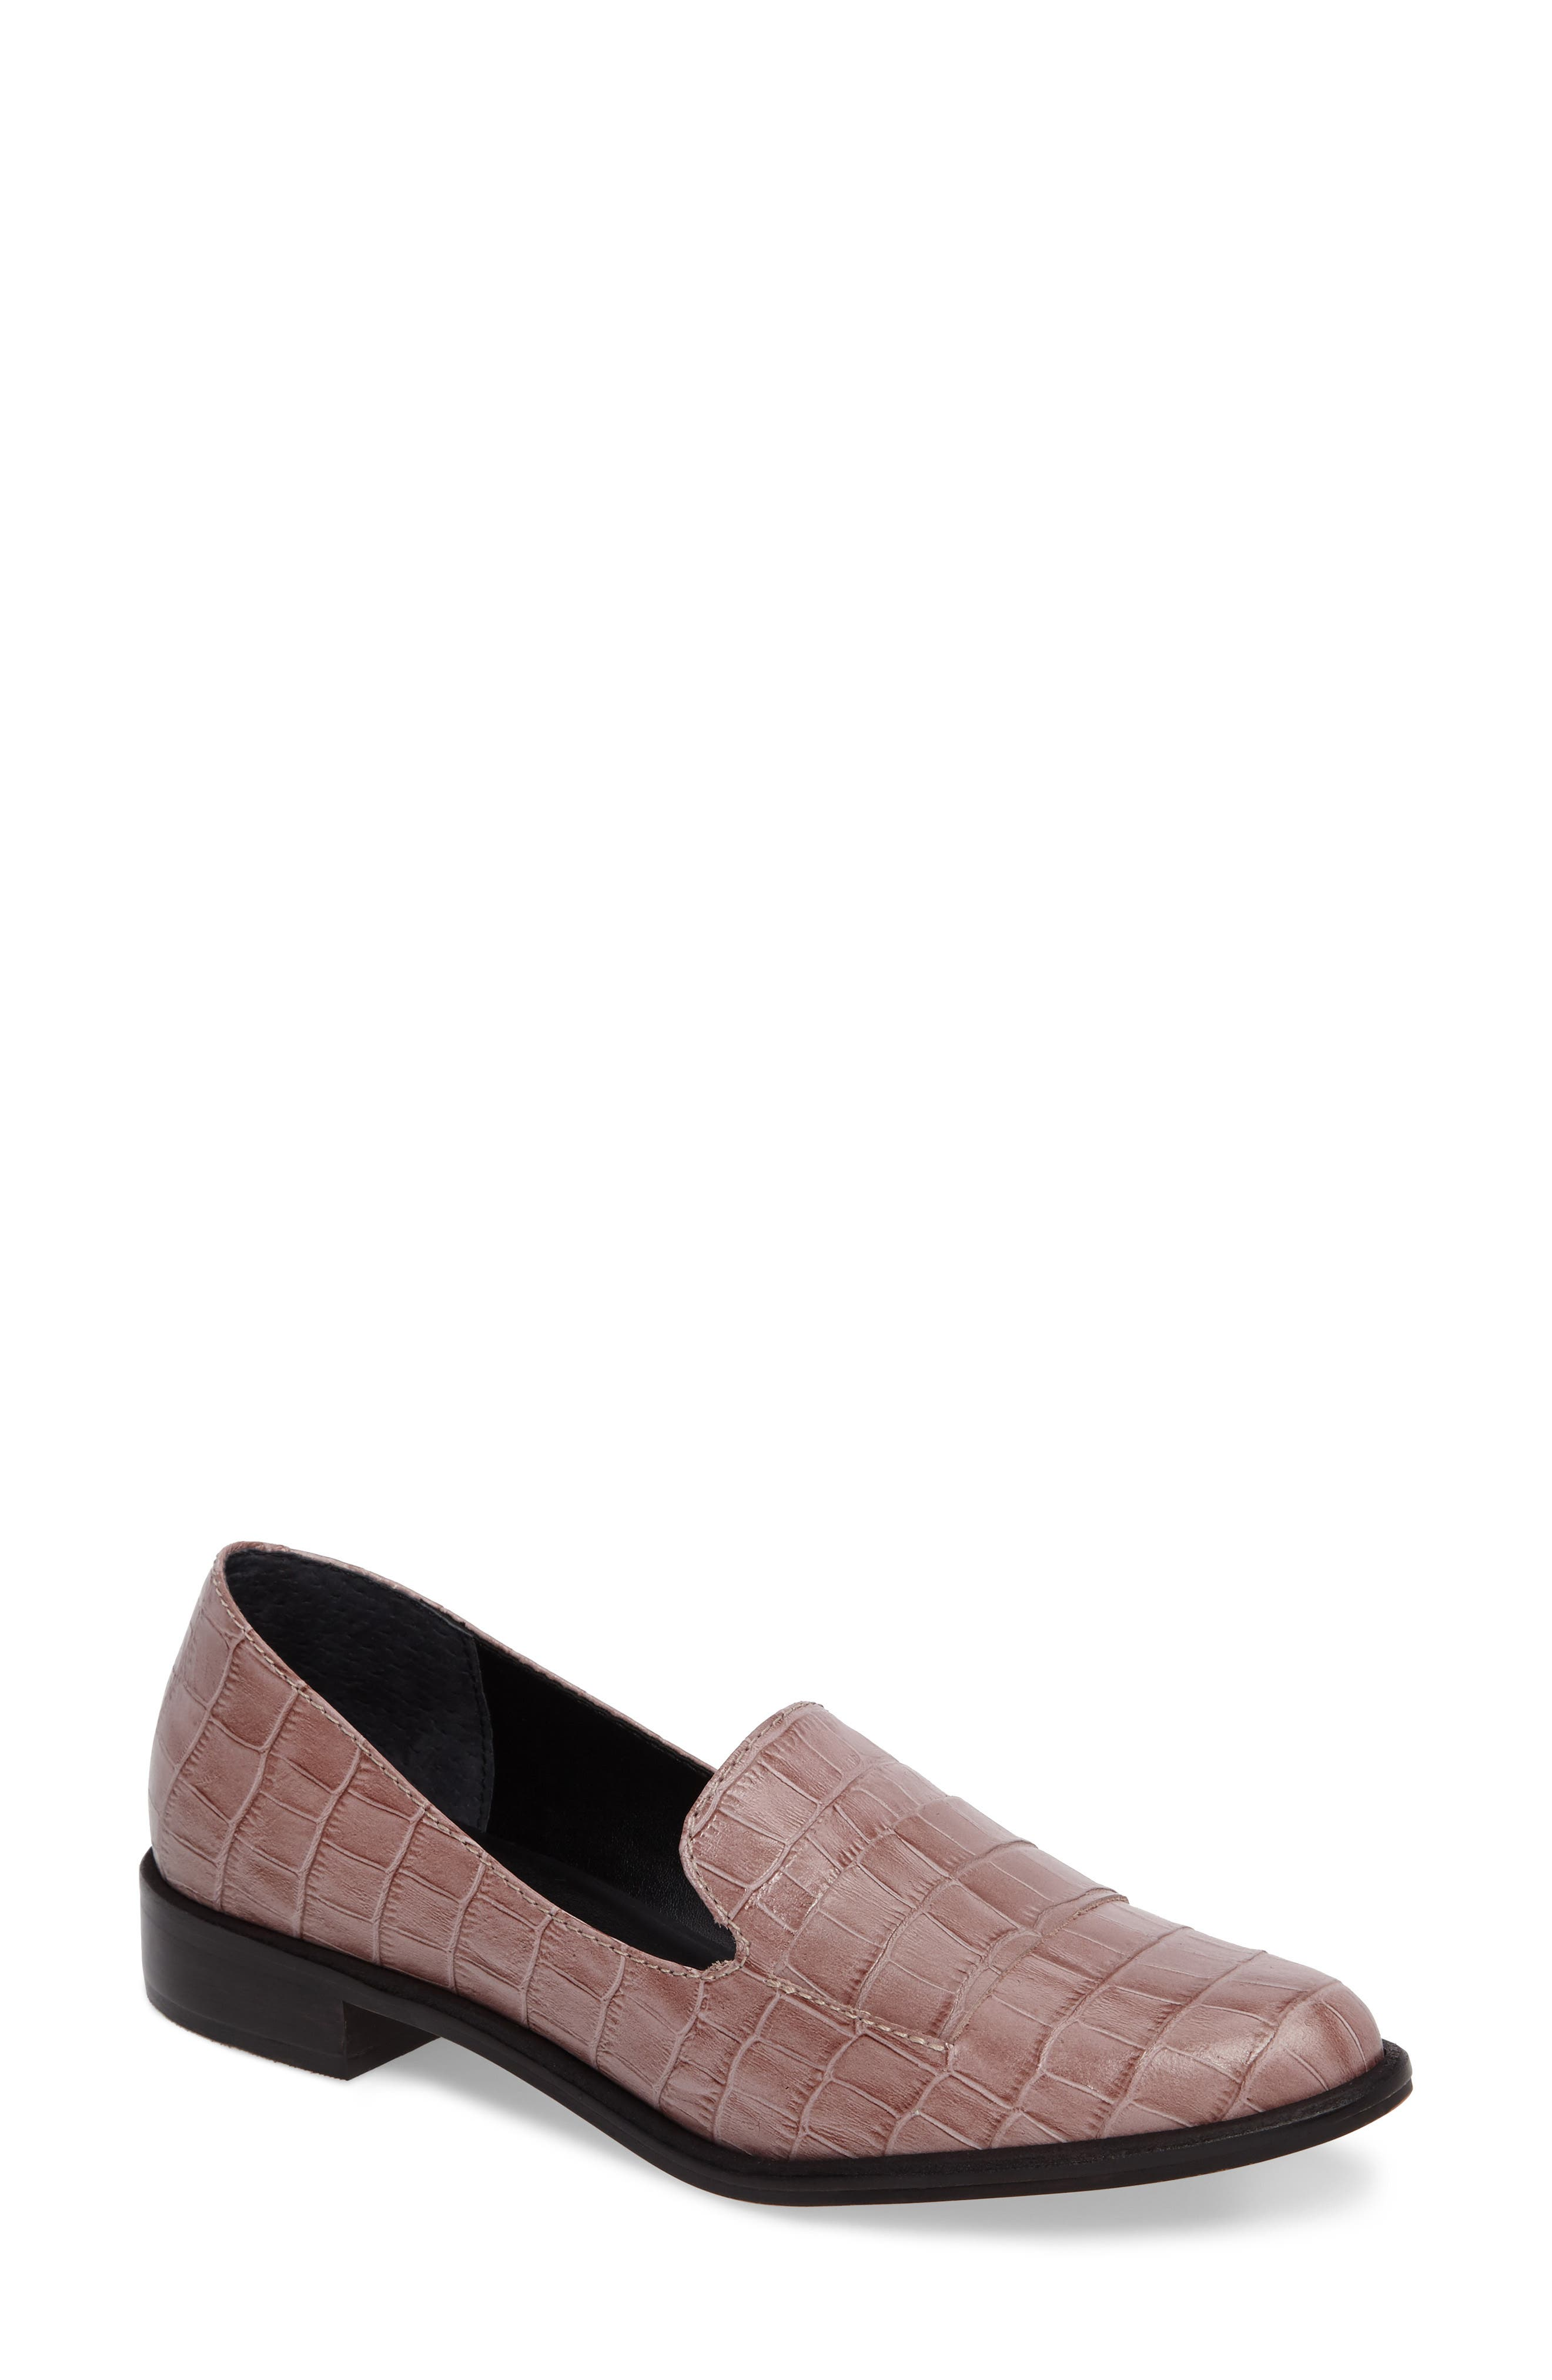 M4D3 'Ocean' Flat Loafer,                             Main thumbnail 6, color,